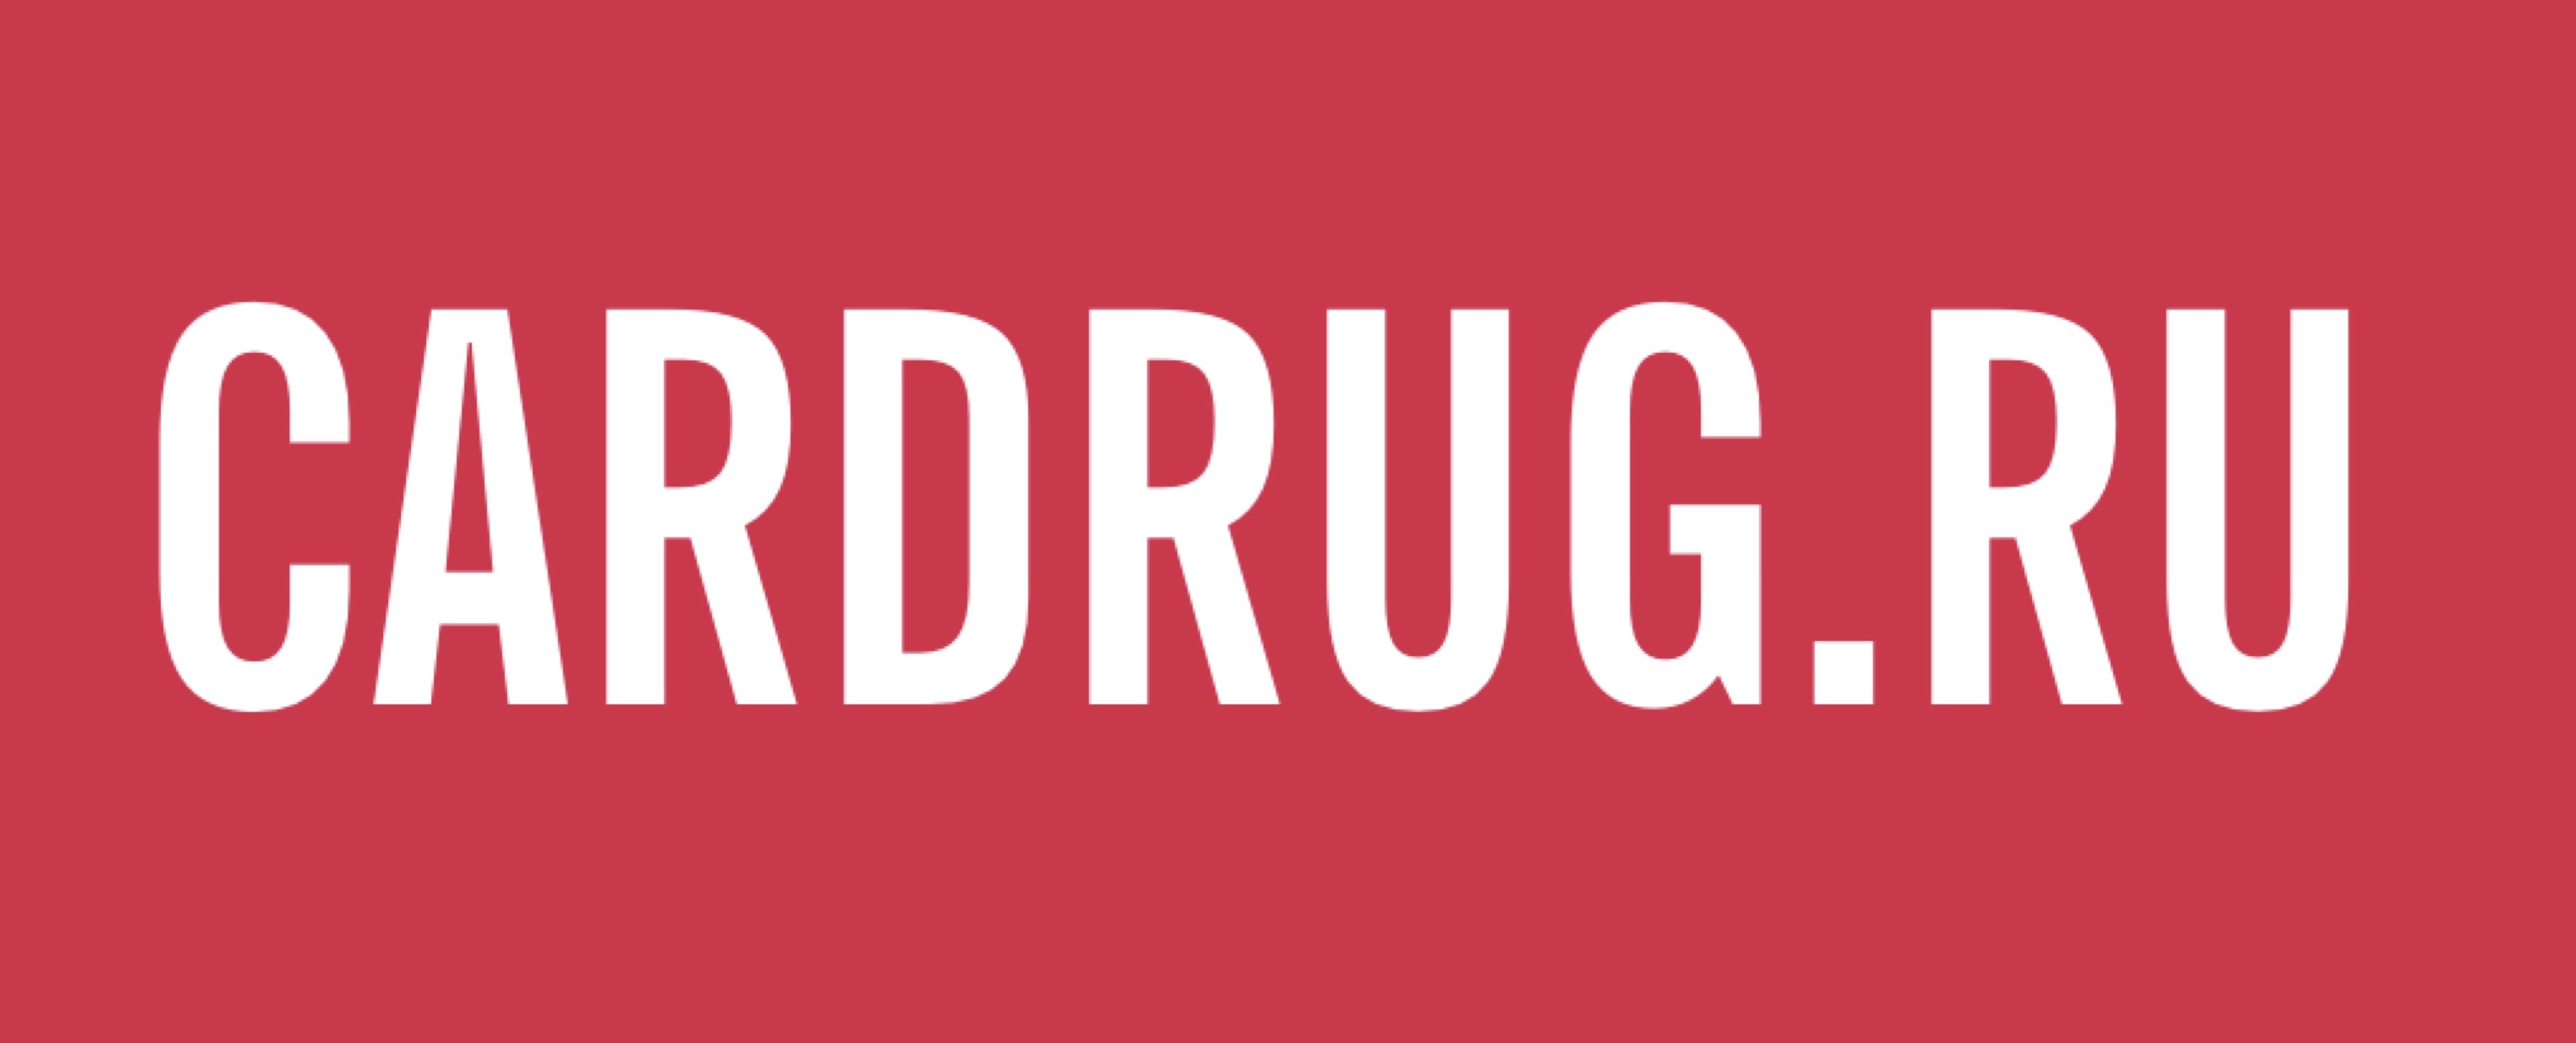 CARDRUG.RU